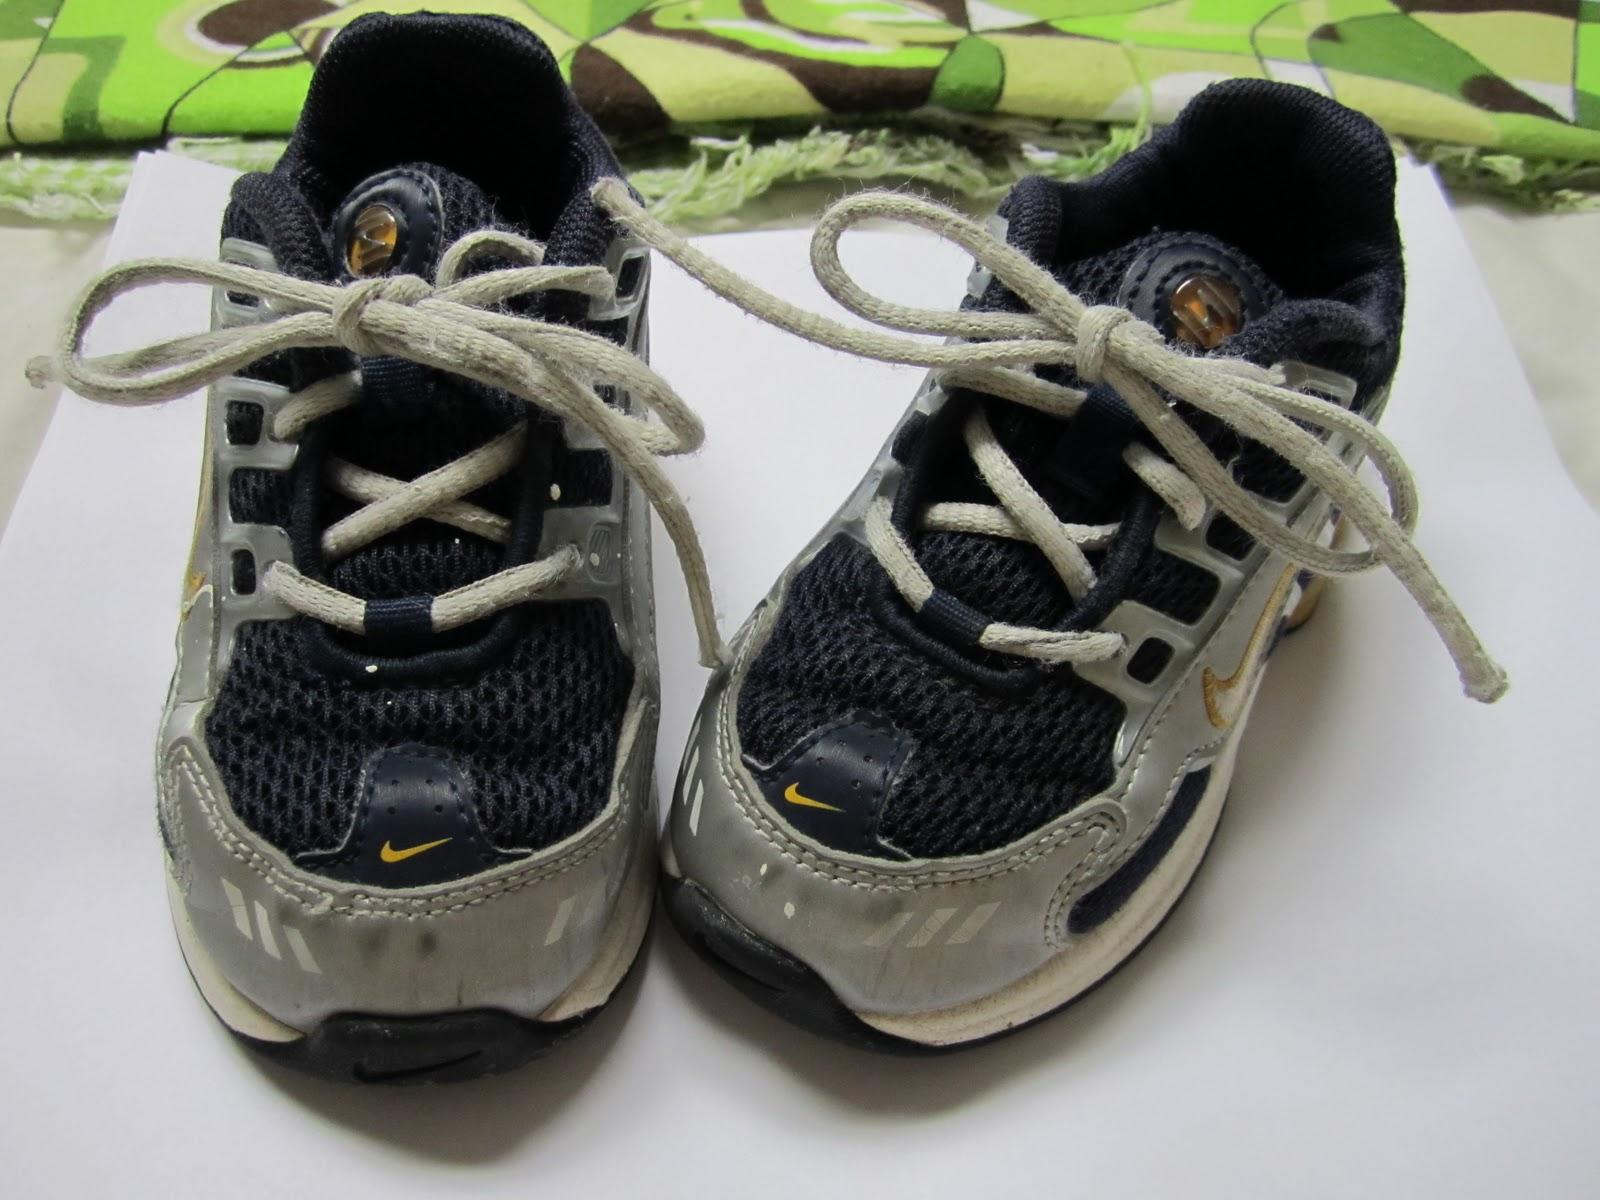 Tennis Shoe Sole Patterns